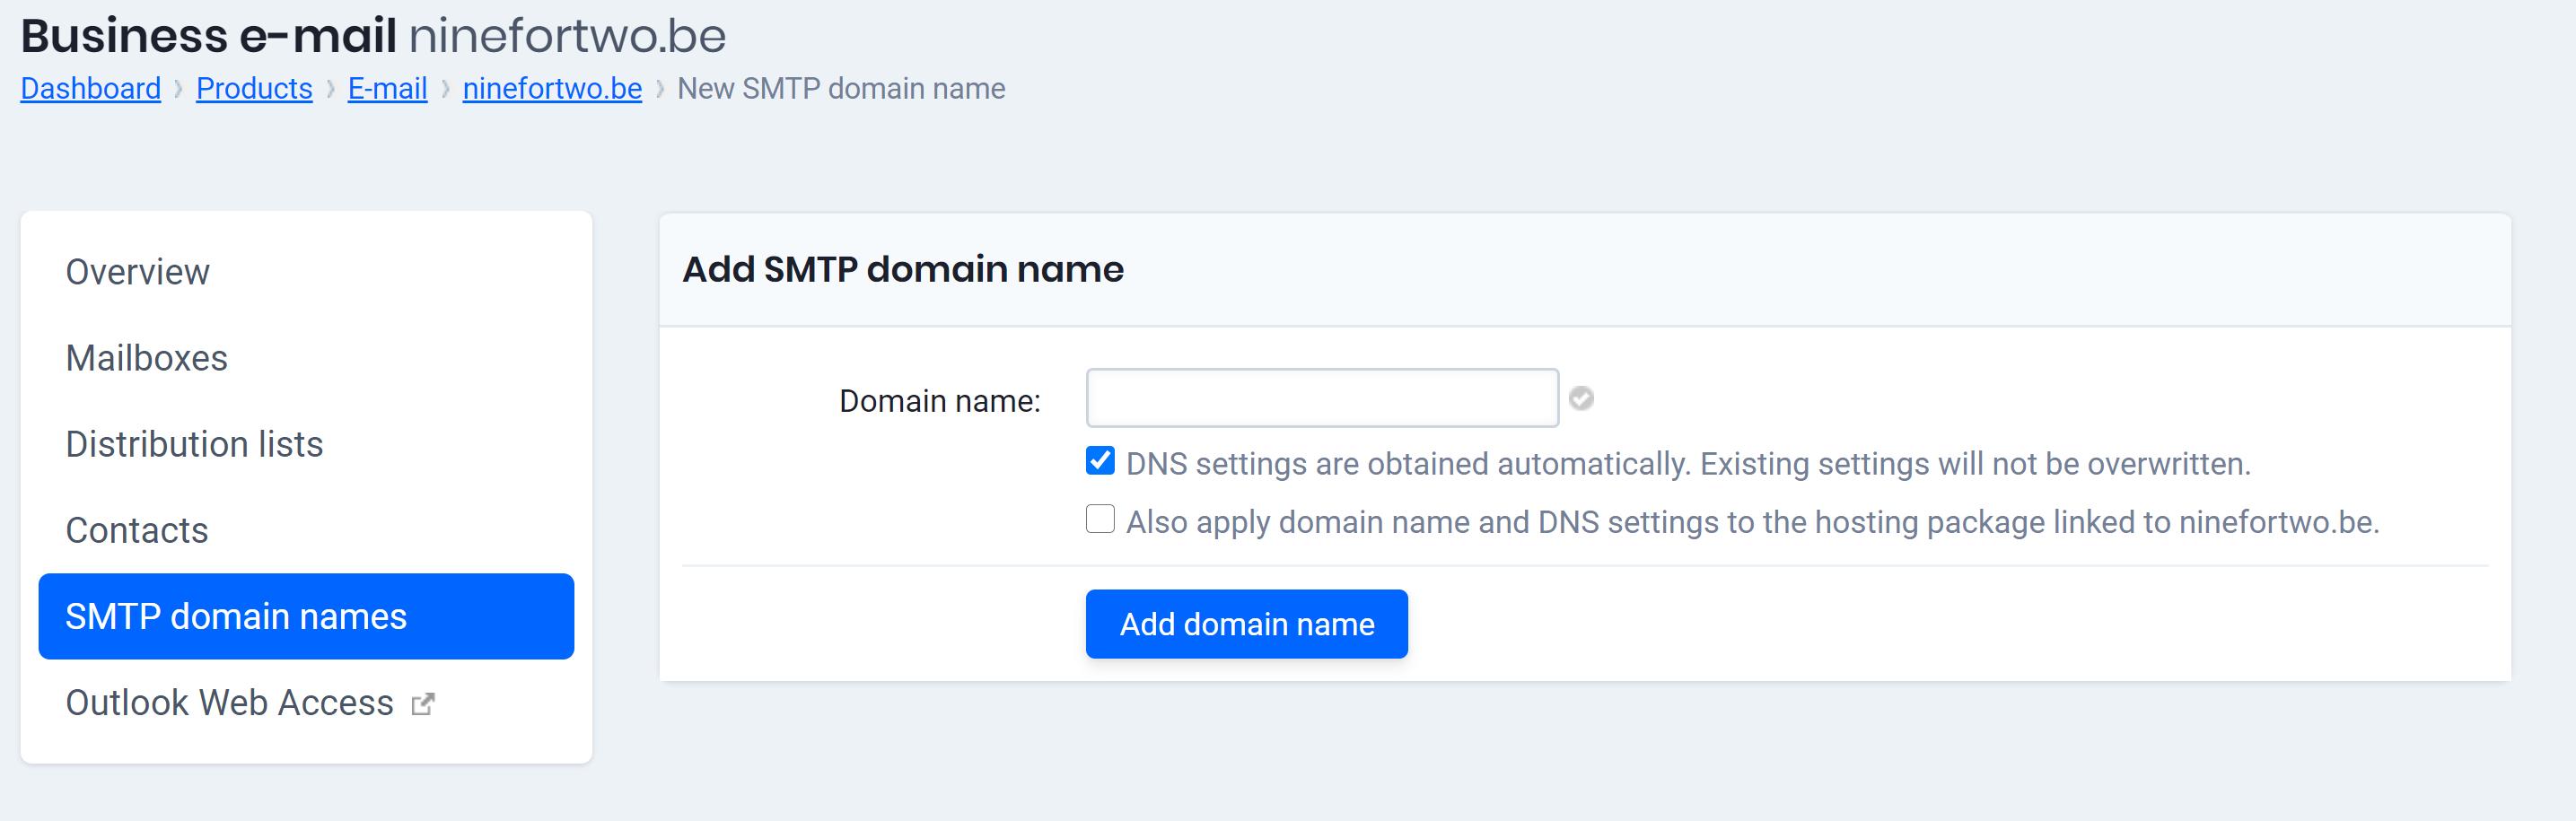 add smtp domain name